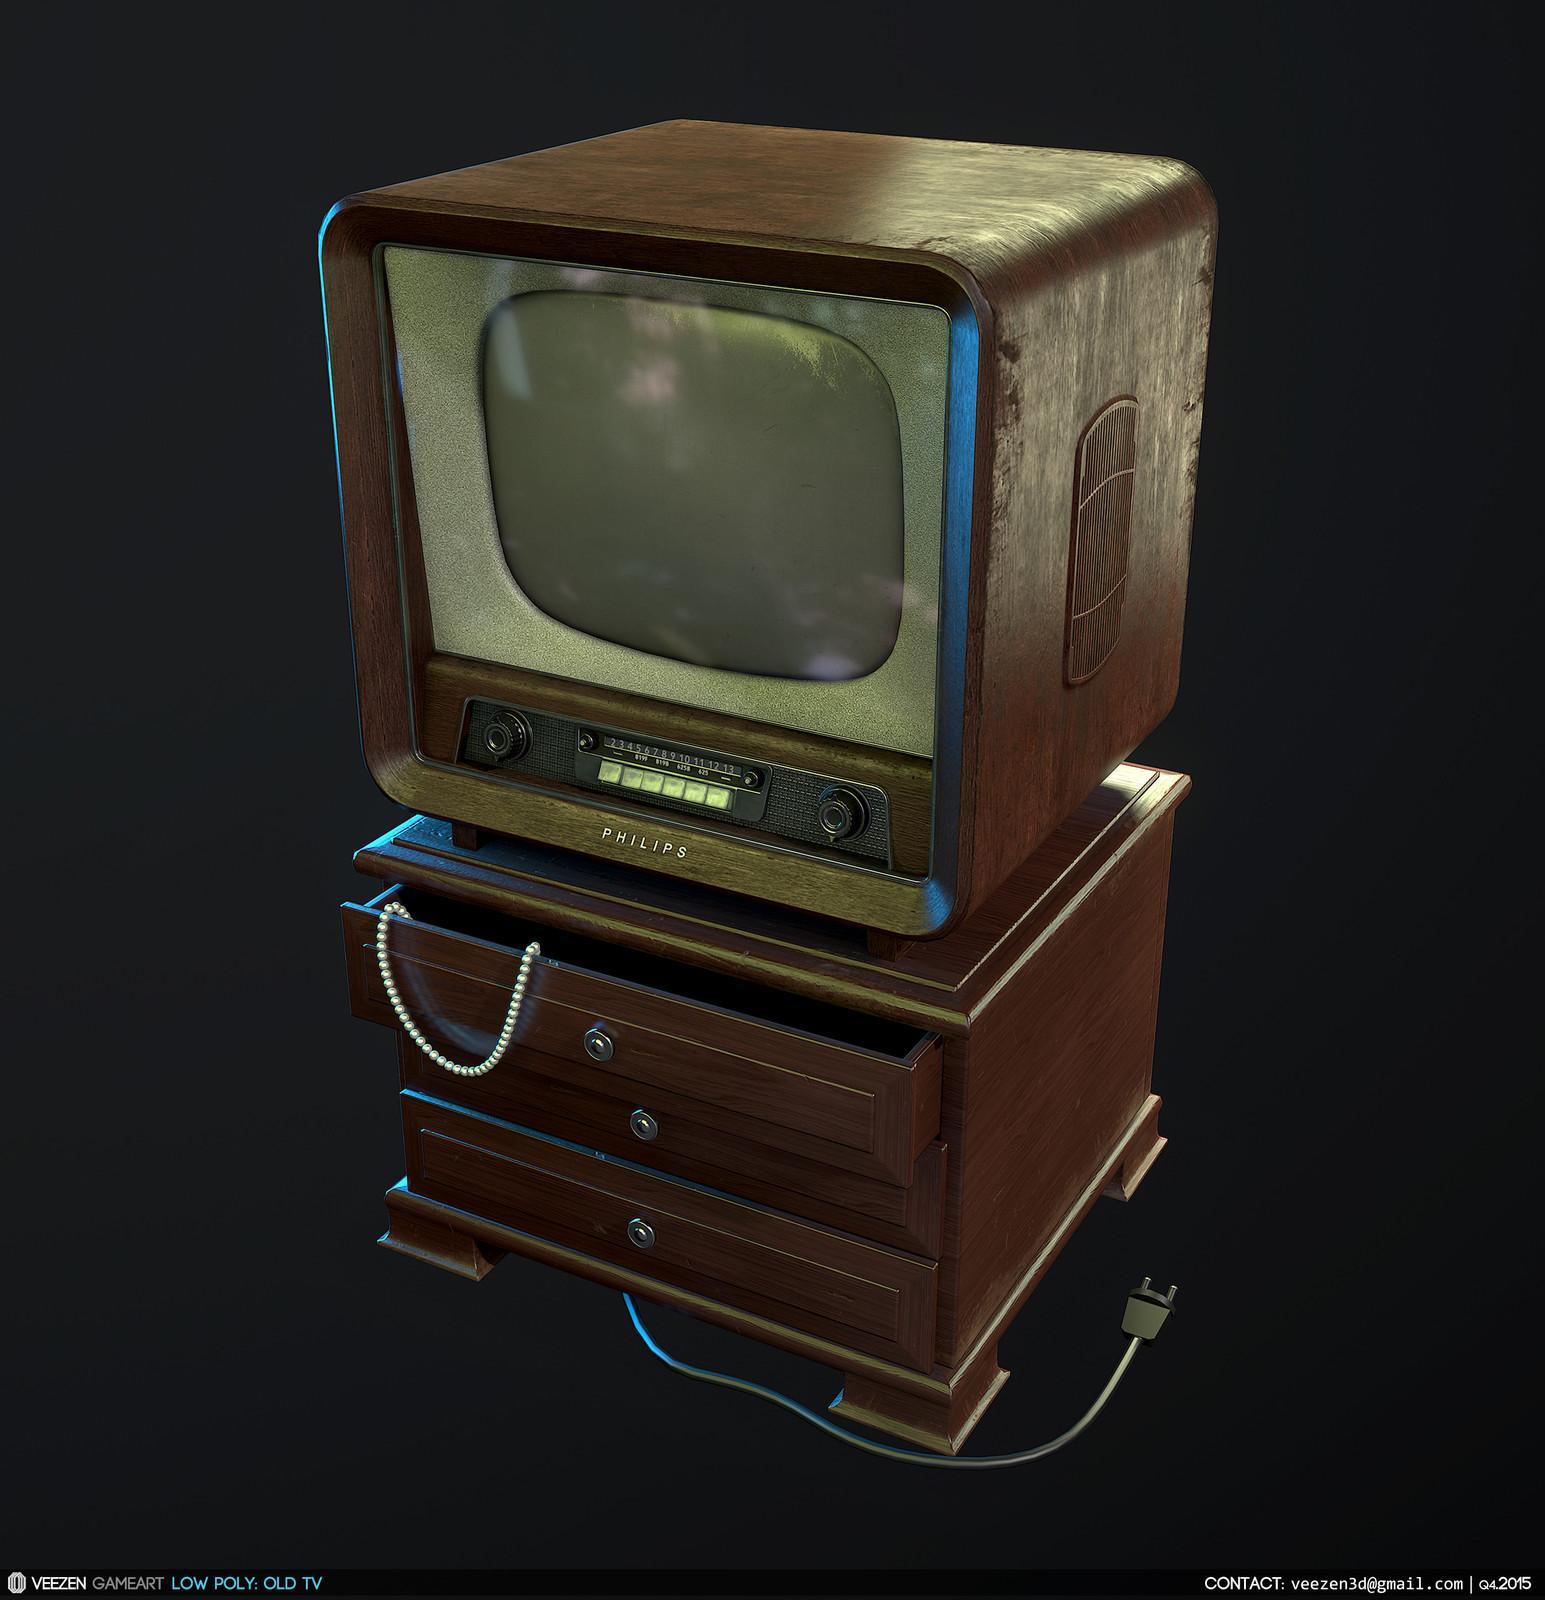 Old Philips TV Set